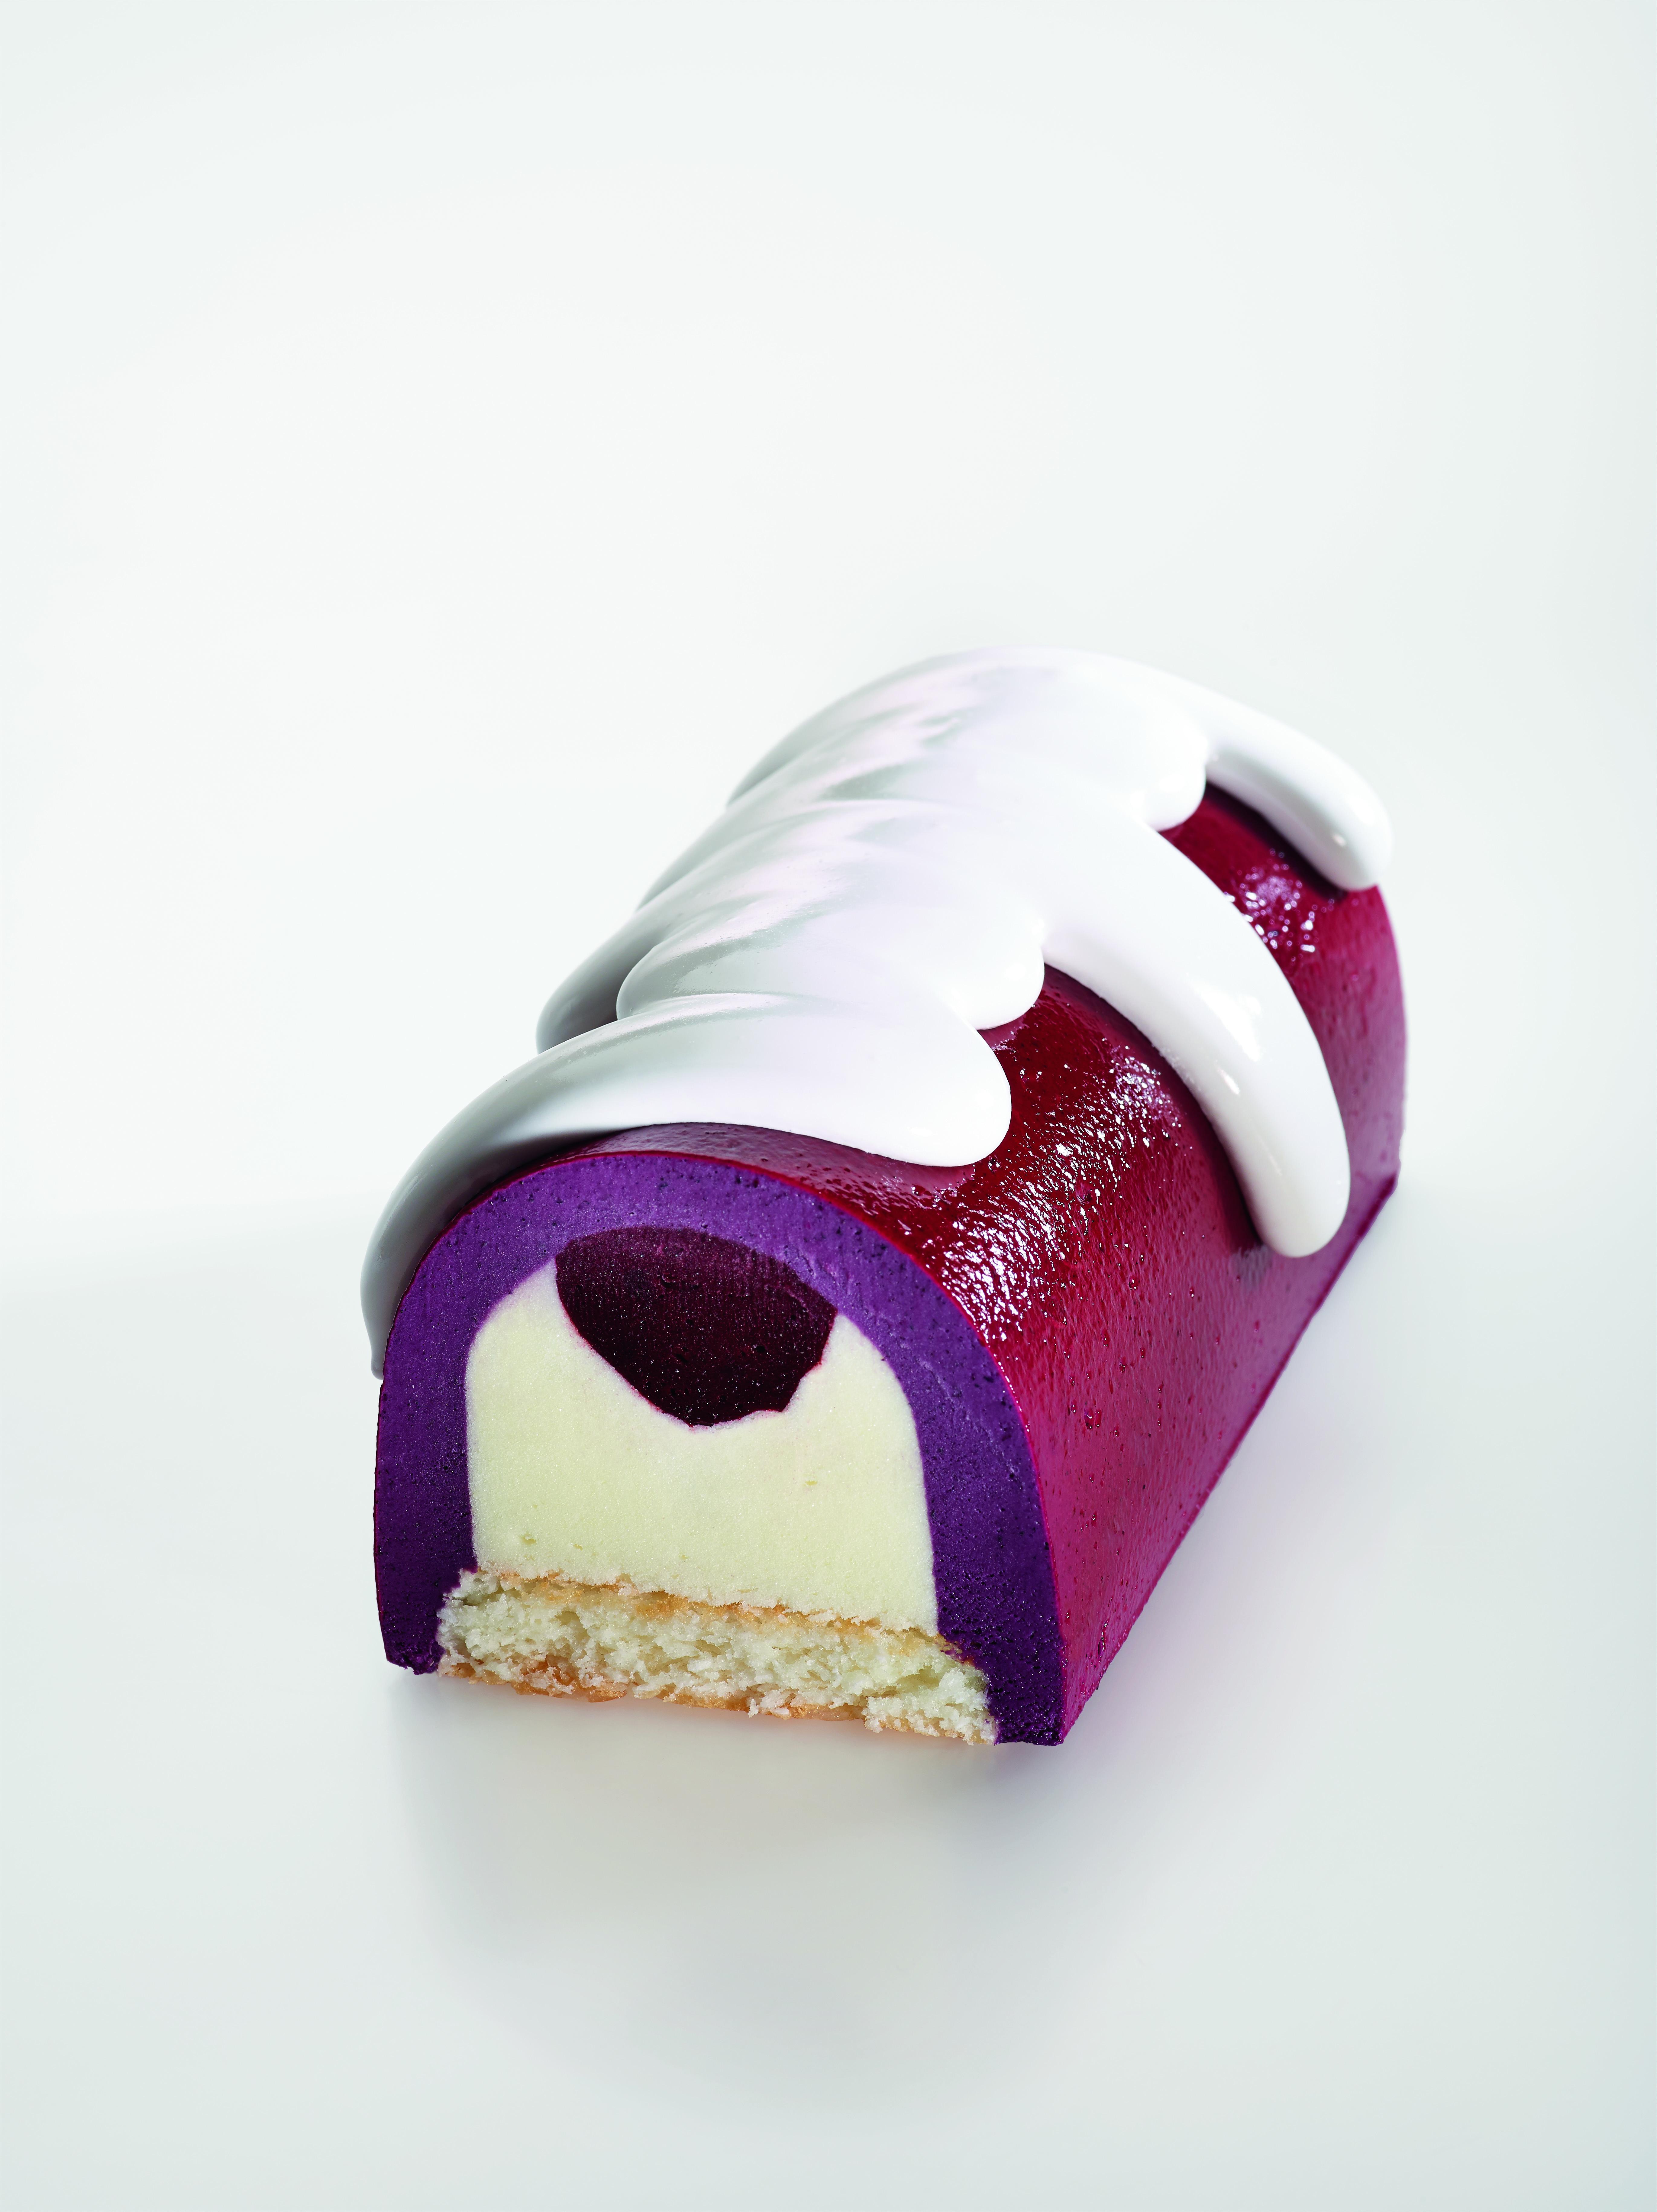 'U' log cake mold (5 cm)